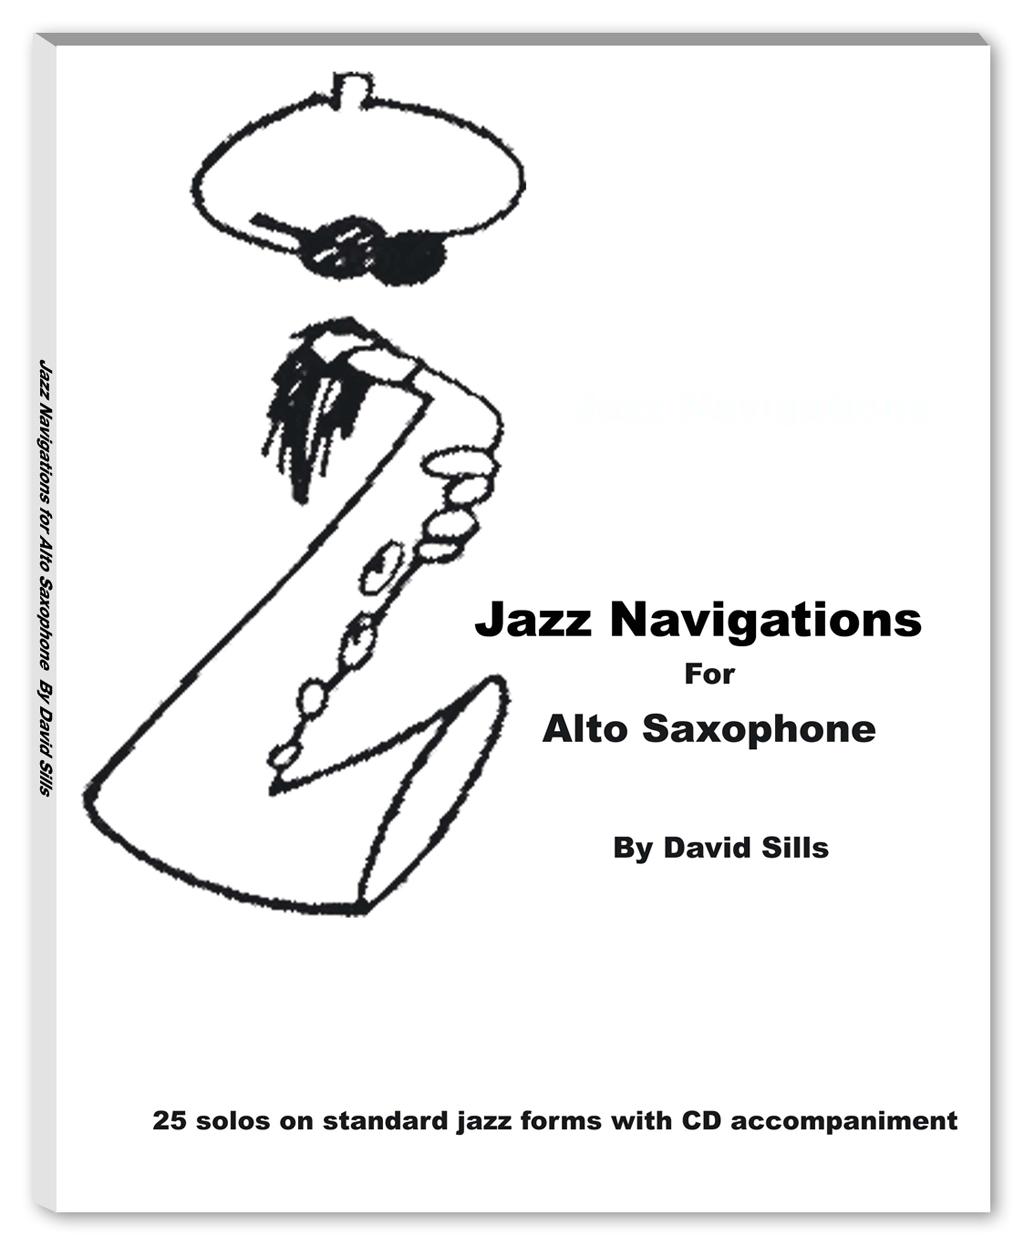 David Sills Jazz Navigations for Alto Saxophone